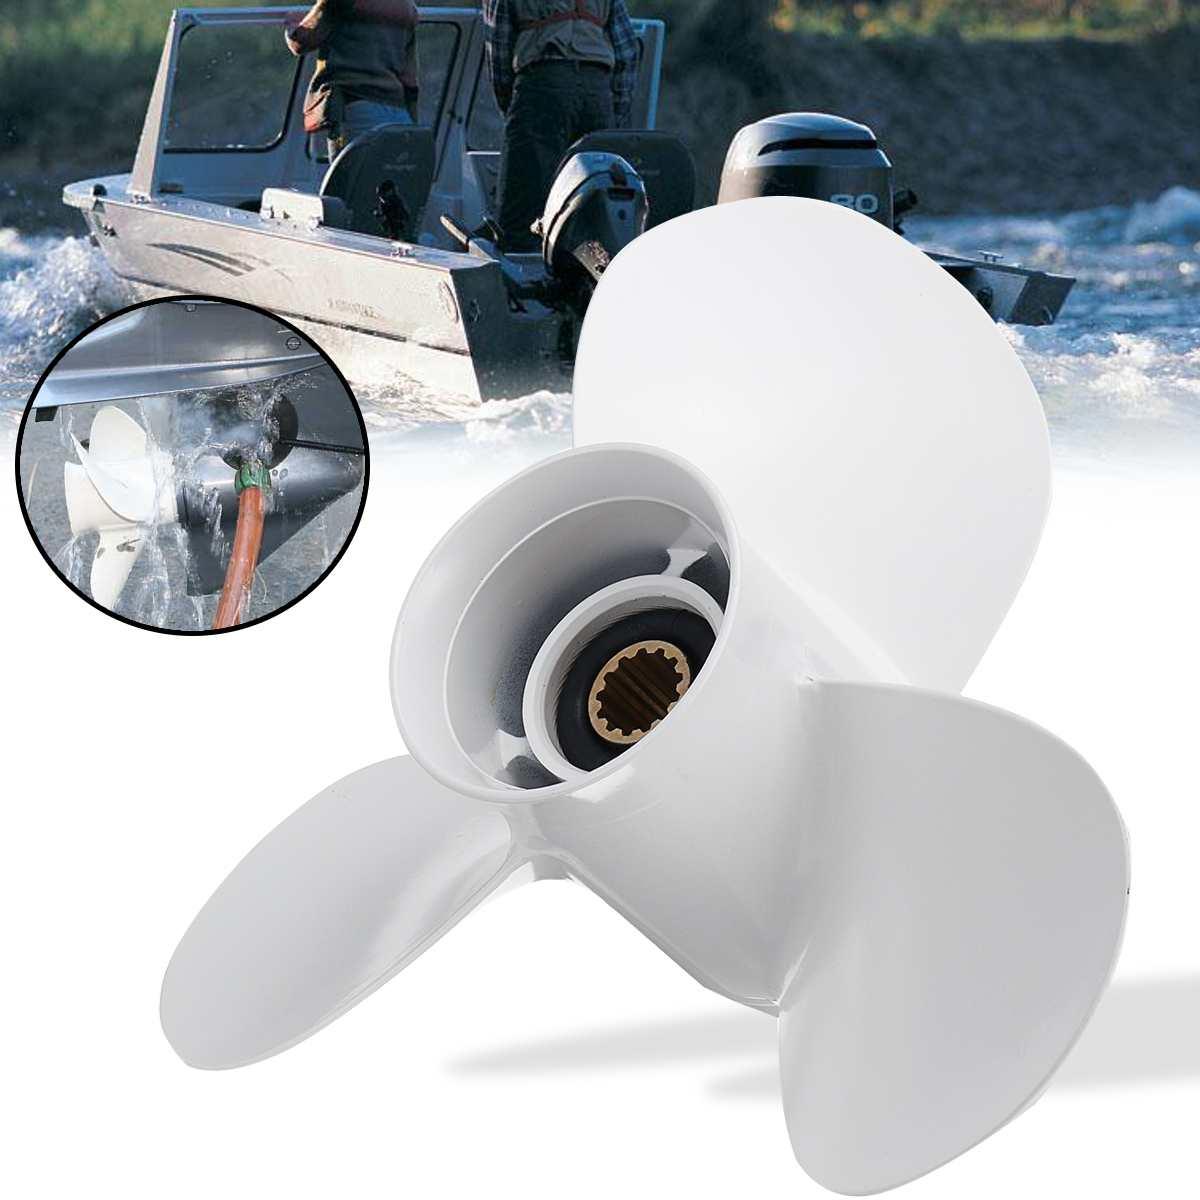 11 1/4 X 14 Marine Propeller For Yamaha 25-60HP 663-45958-01-EL Aluminum Boat Outboard Propeller 13 Spline Tooth 3 Blade